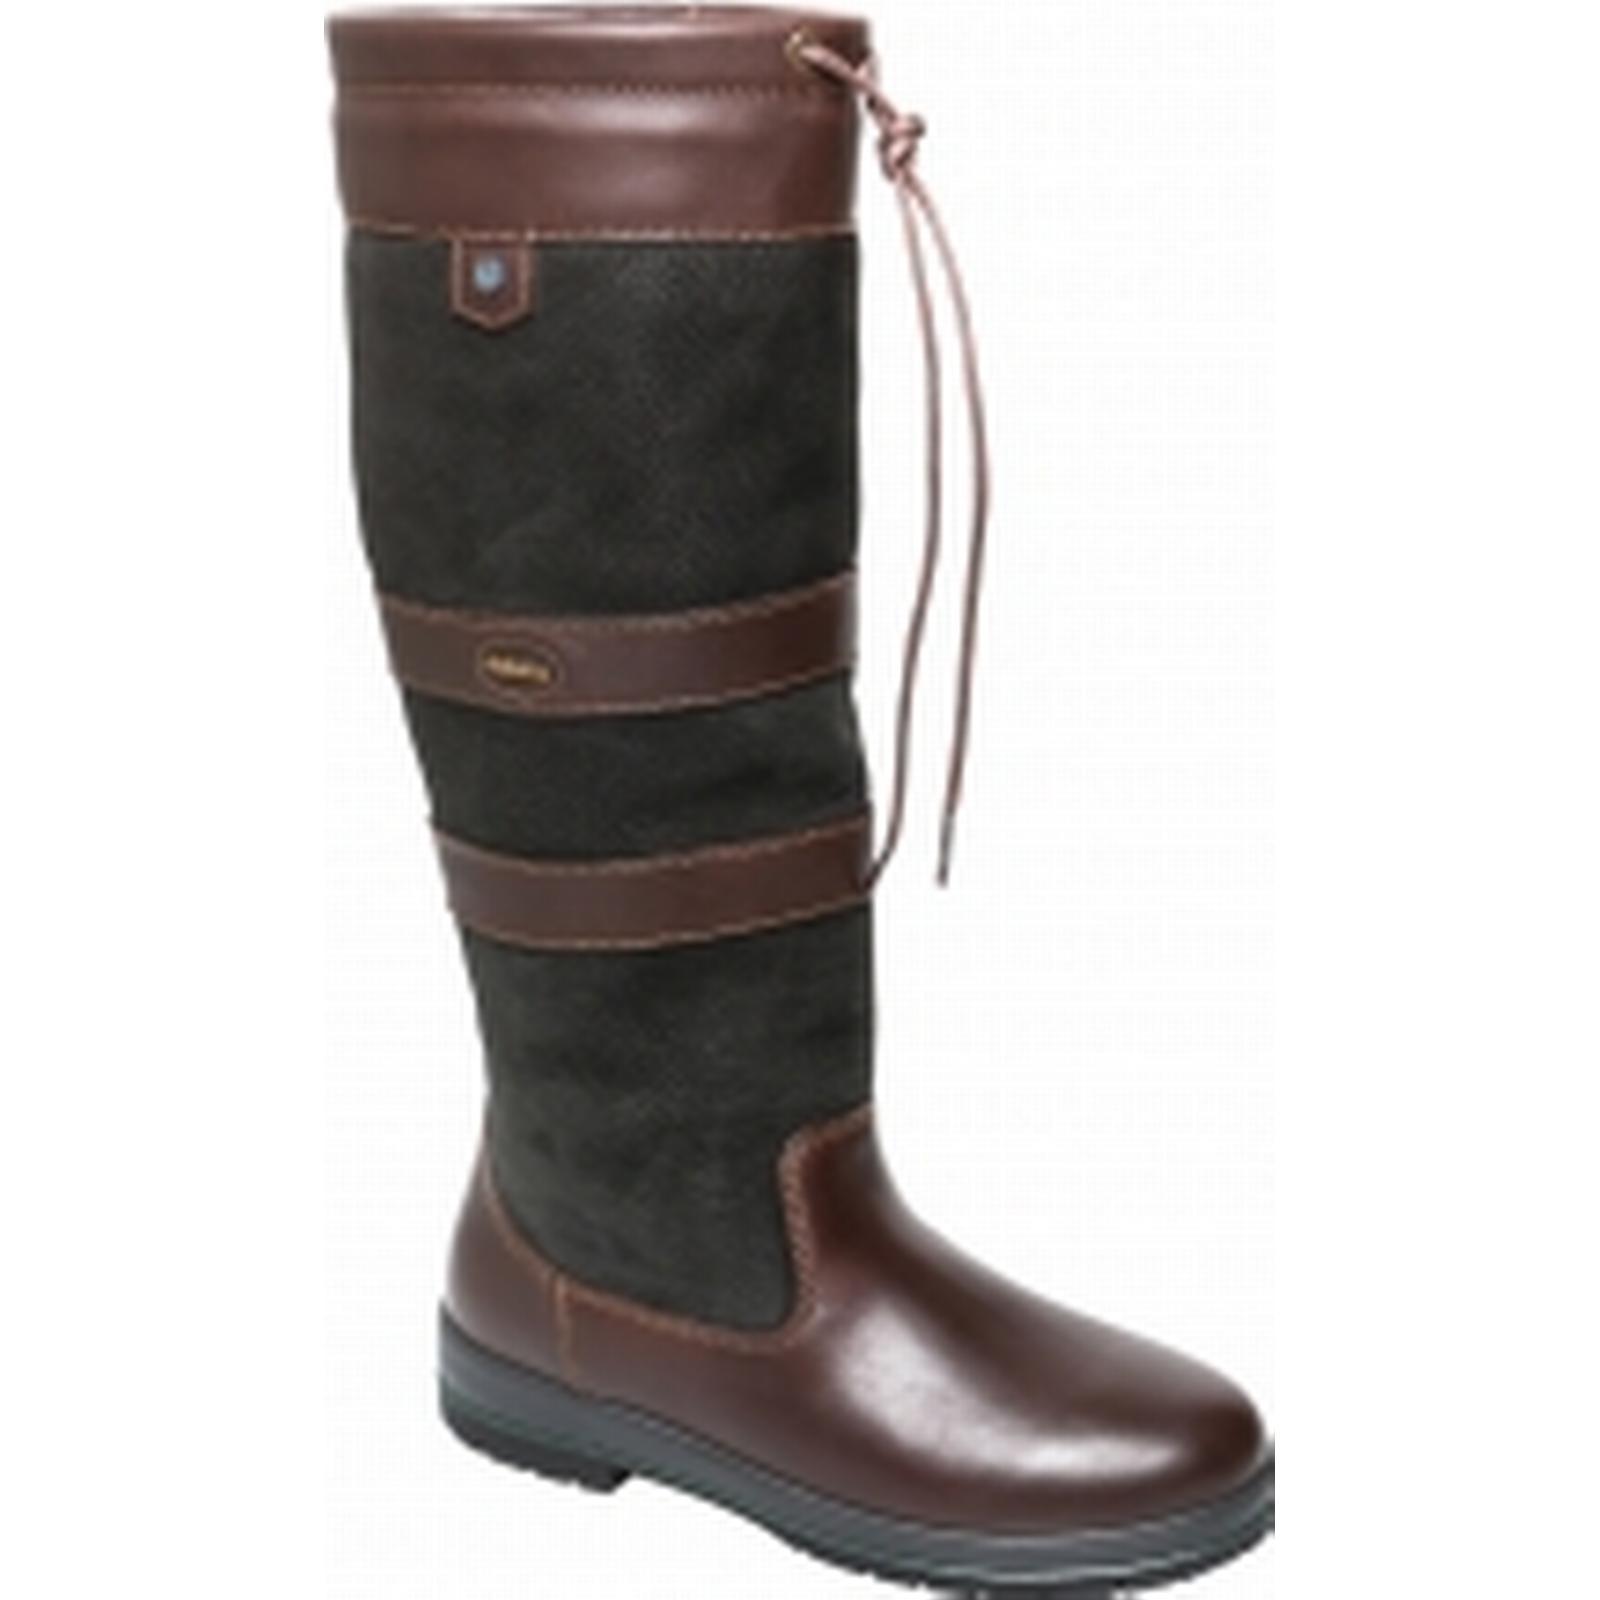 Dubarry Galway Galway Dubarry Boots, Black/Brown, EU39 (UK5.5) 8f1cc9